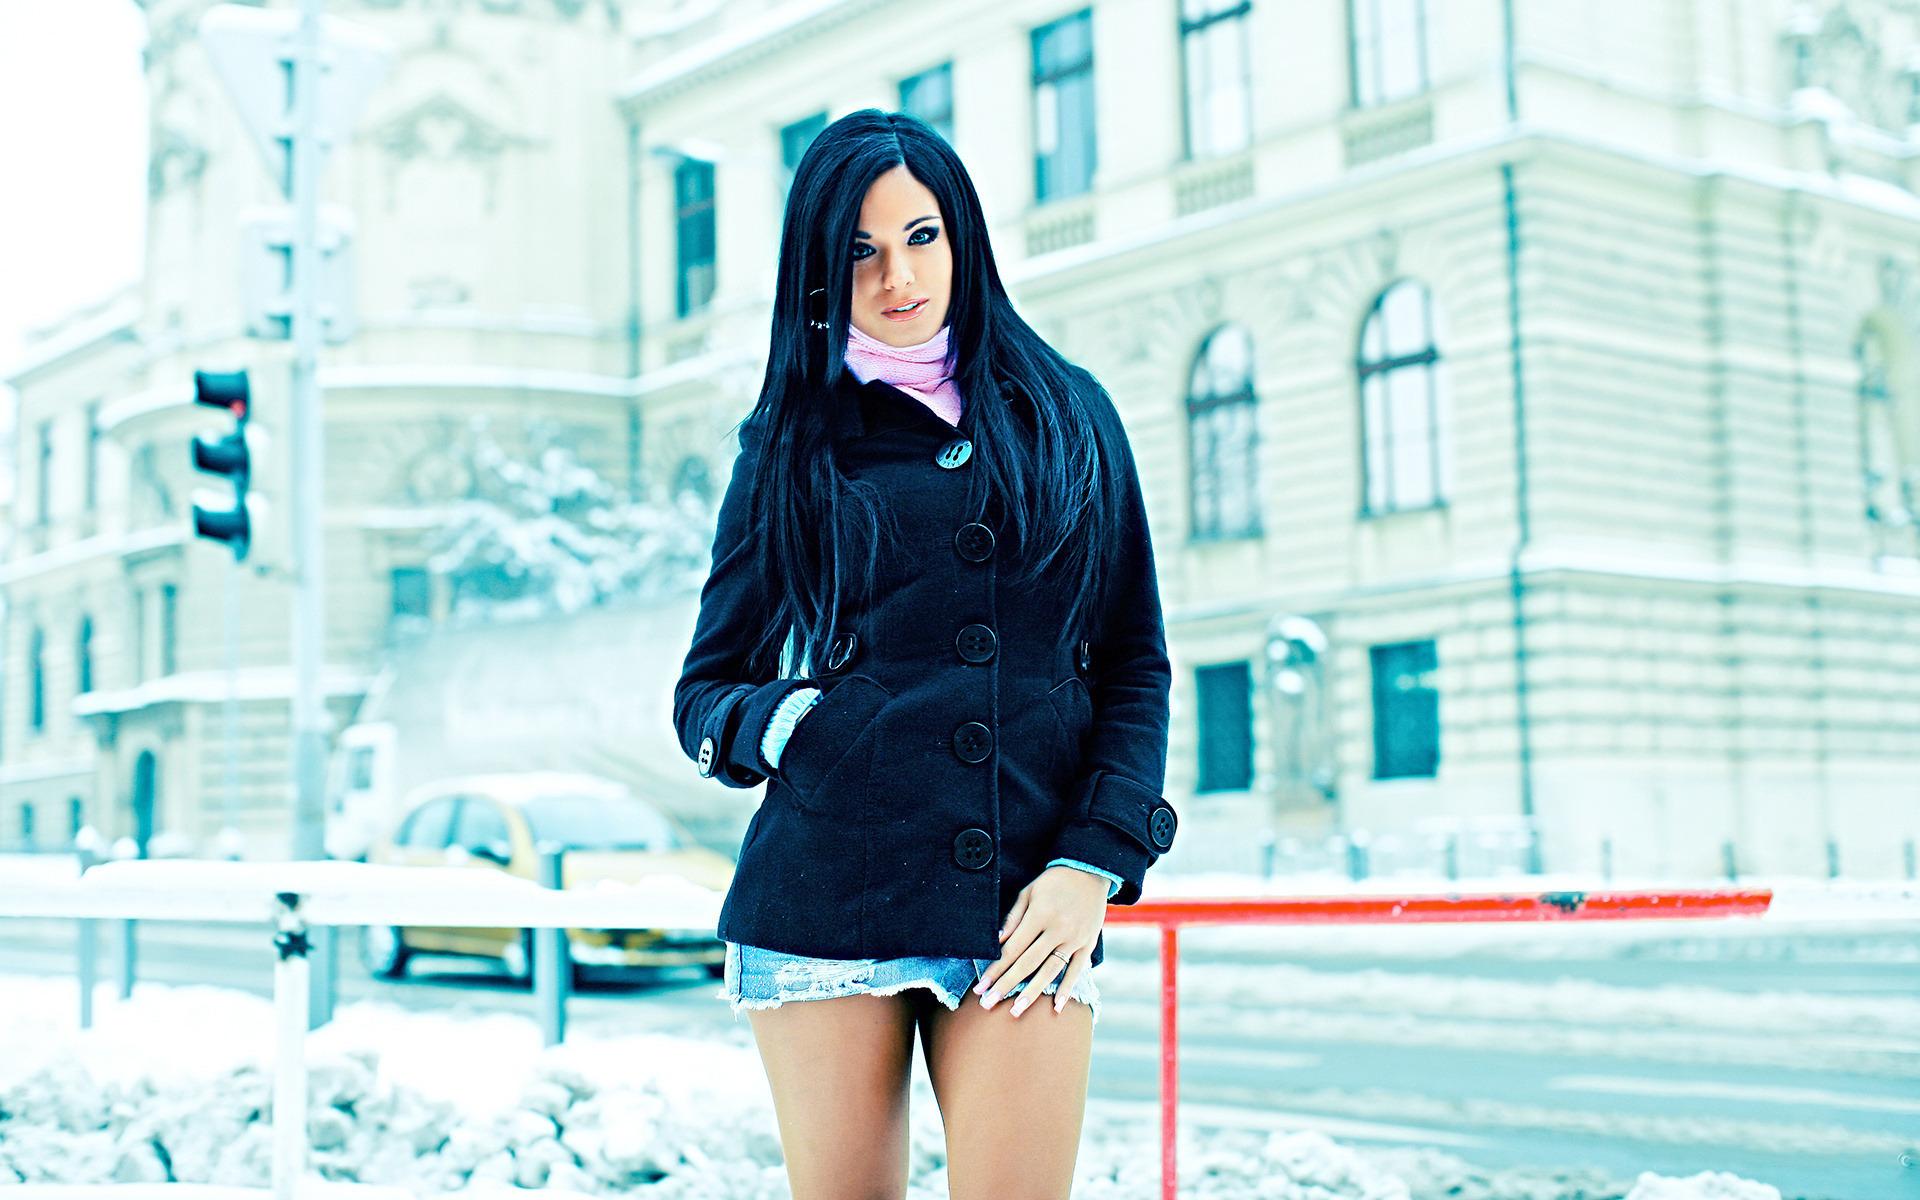 Фото телок волгограда, Индивидуалки Волгограда с проверенными фото 1 фотография